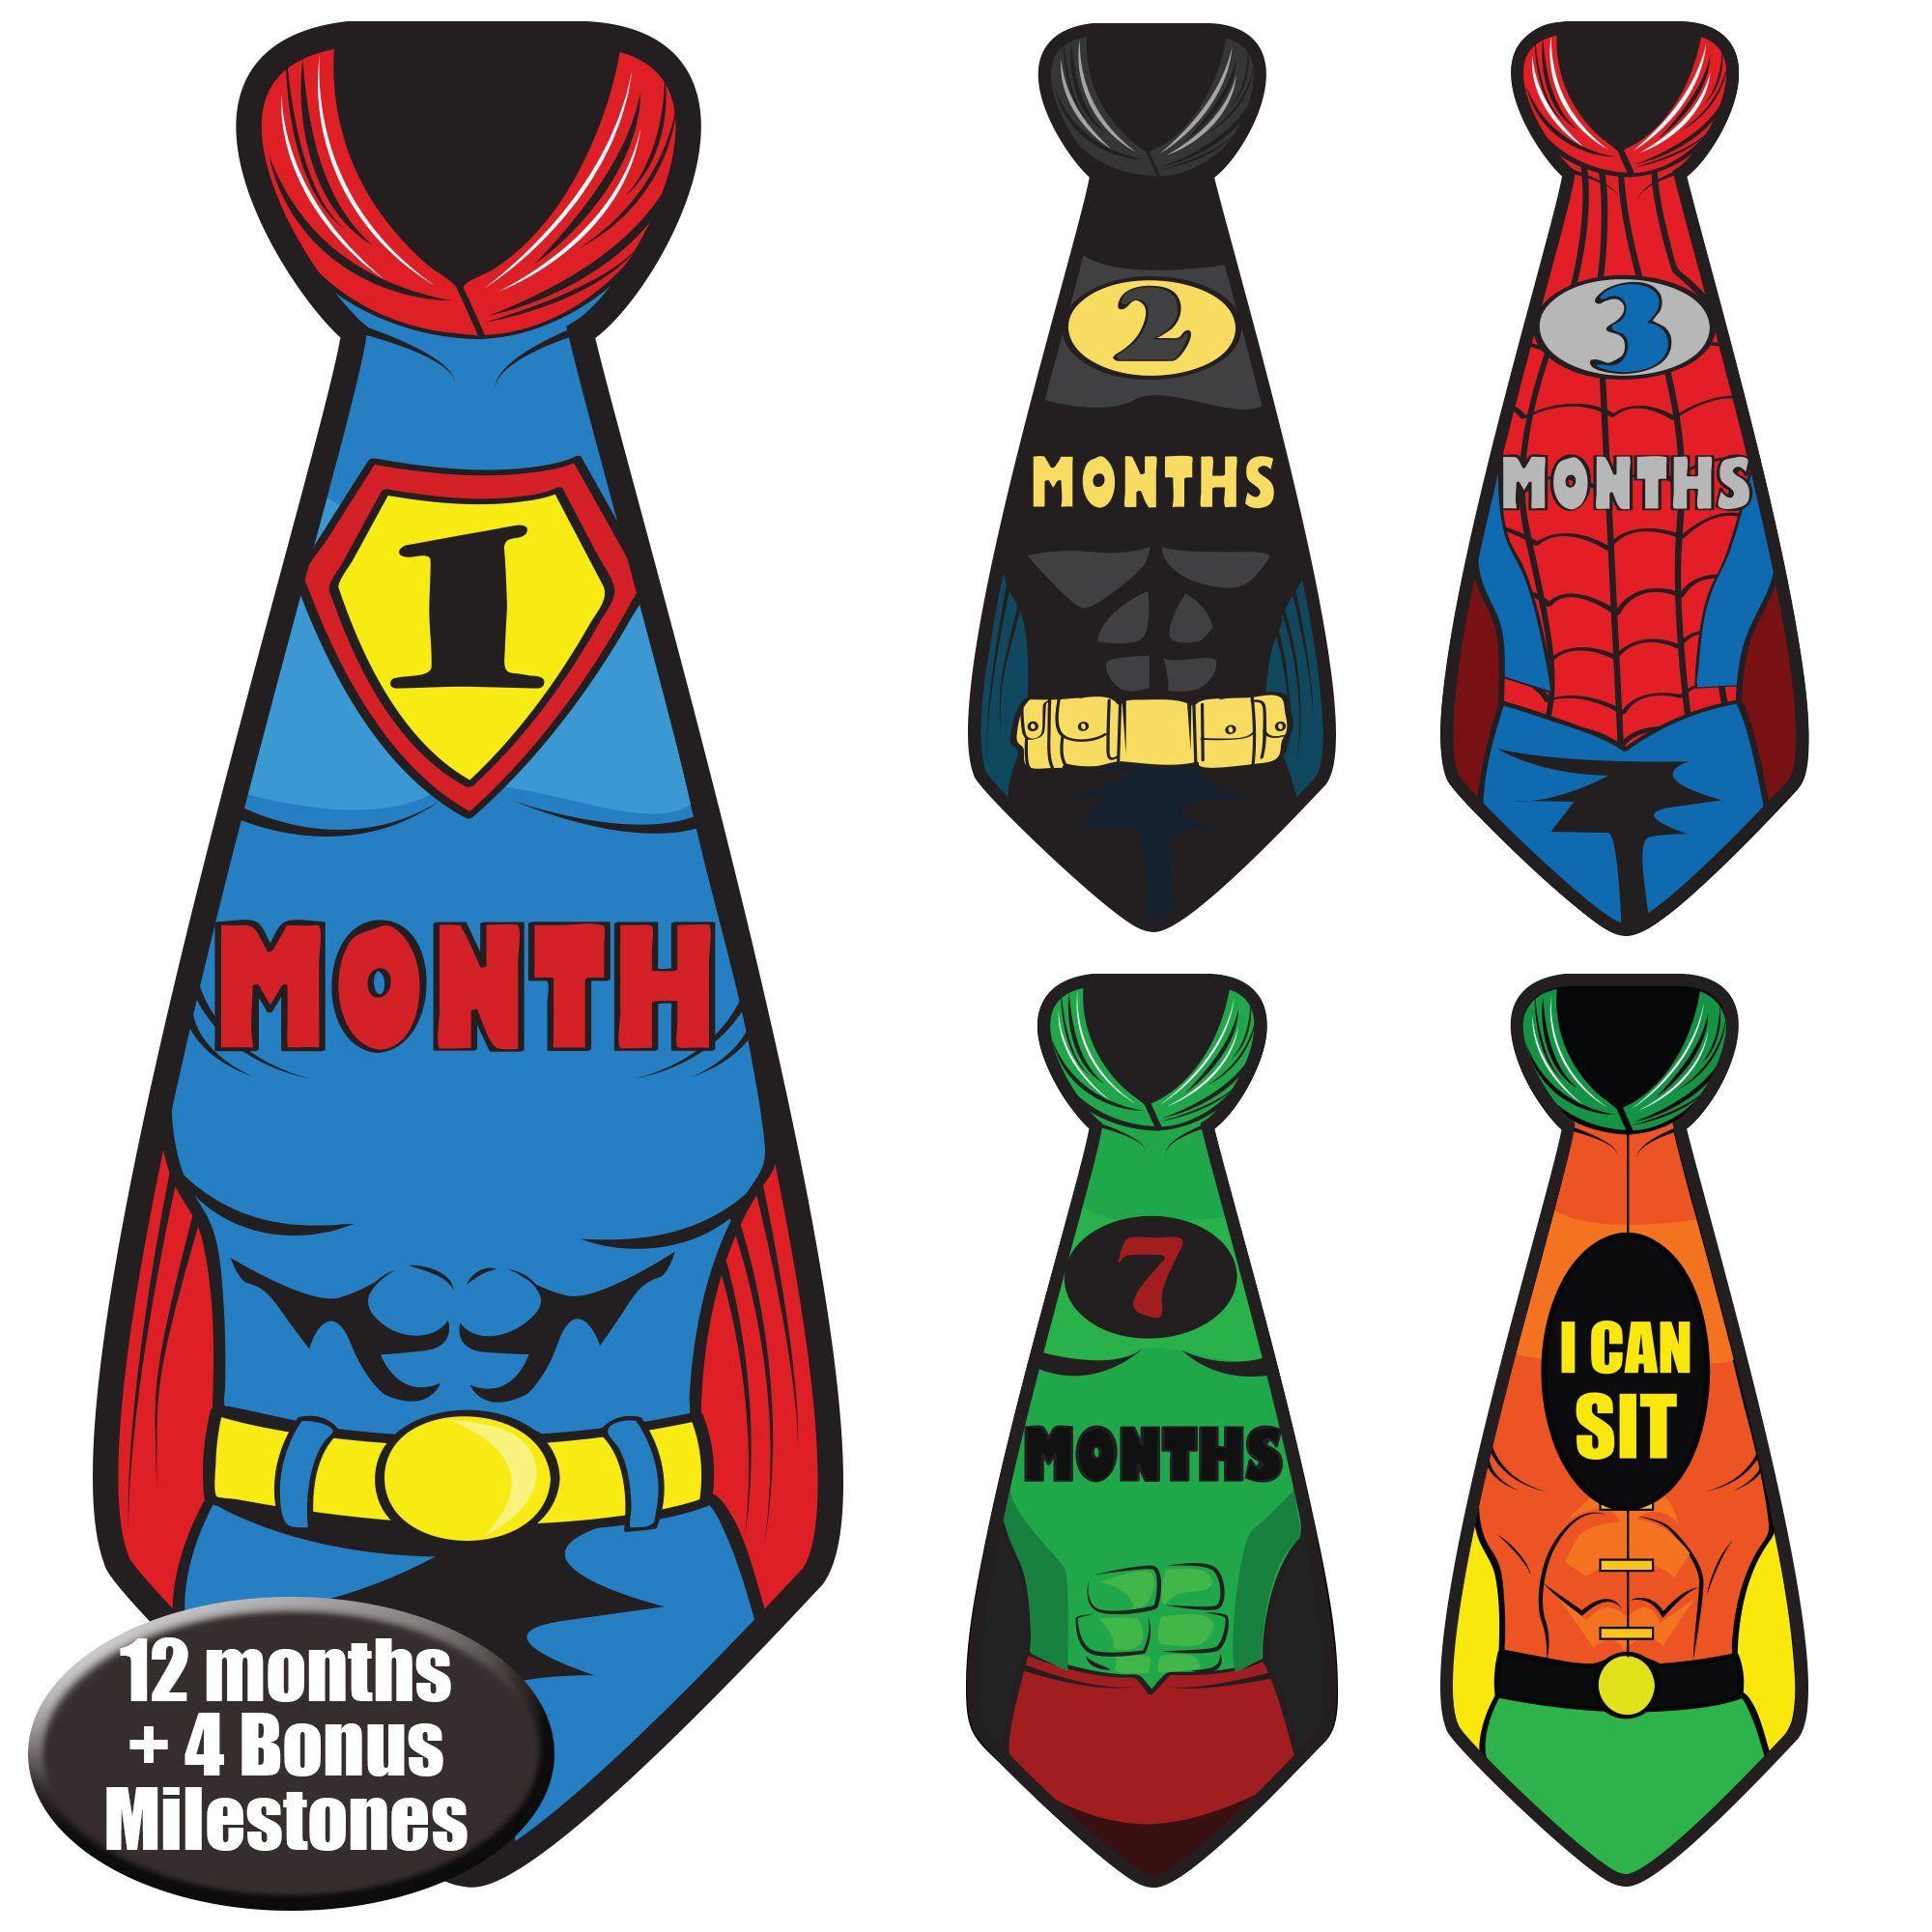 Newborn Baby Monthly Superhero Stickers - Great Shower Registry Gift or Scrapbook Photo Keepsake